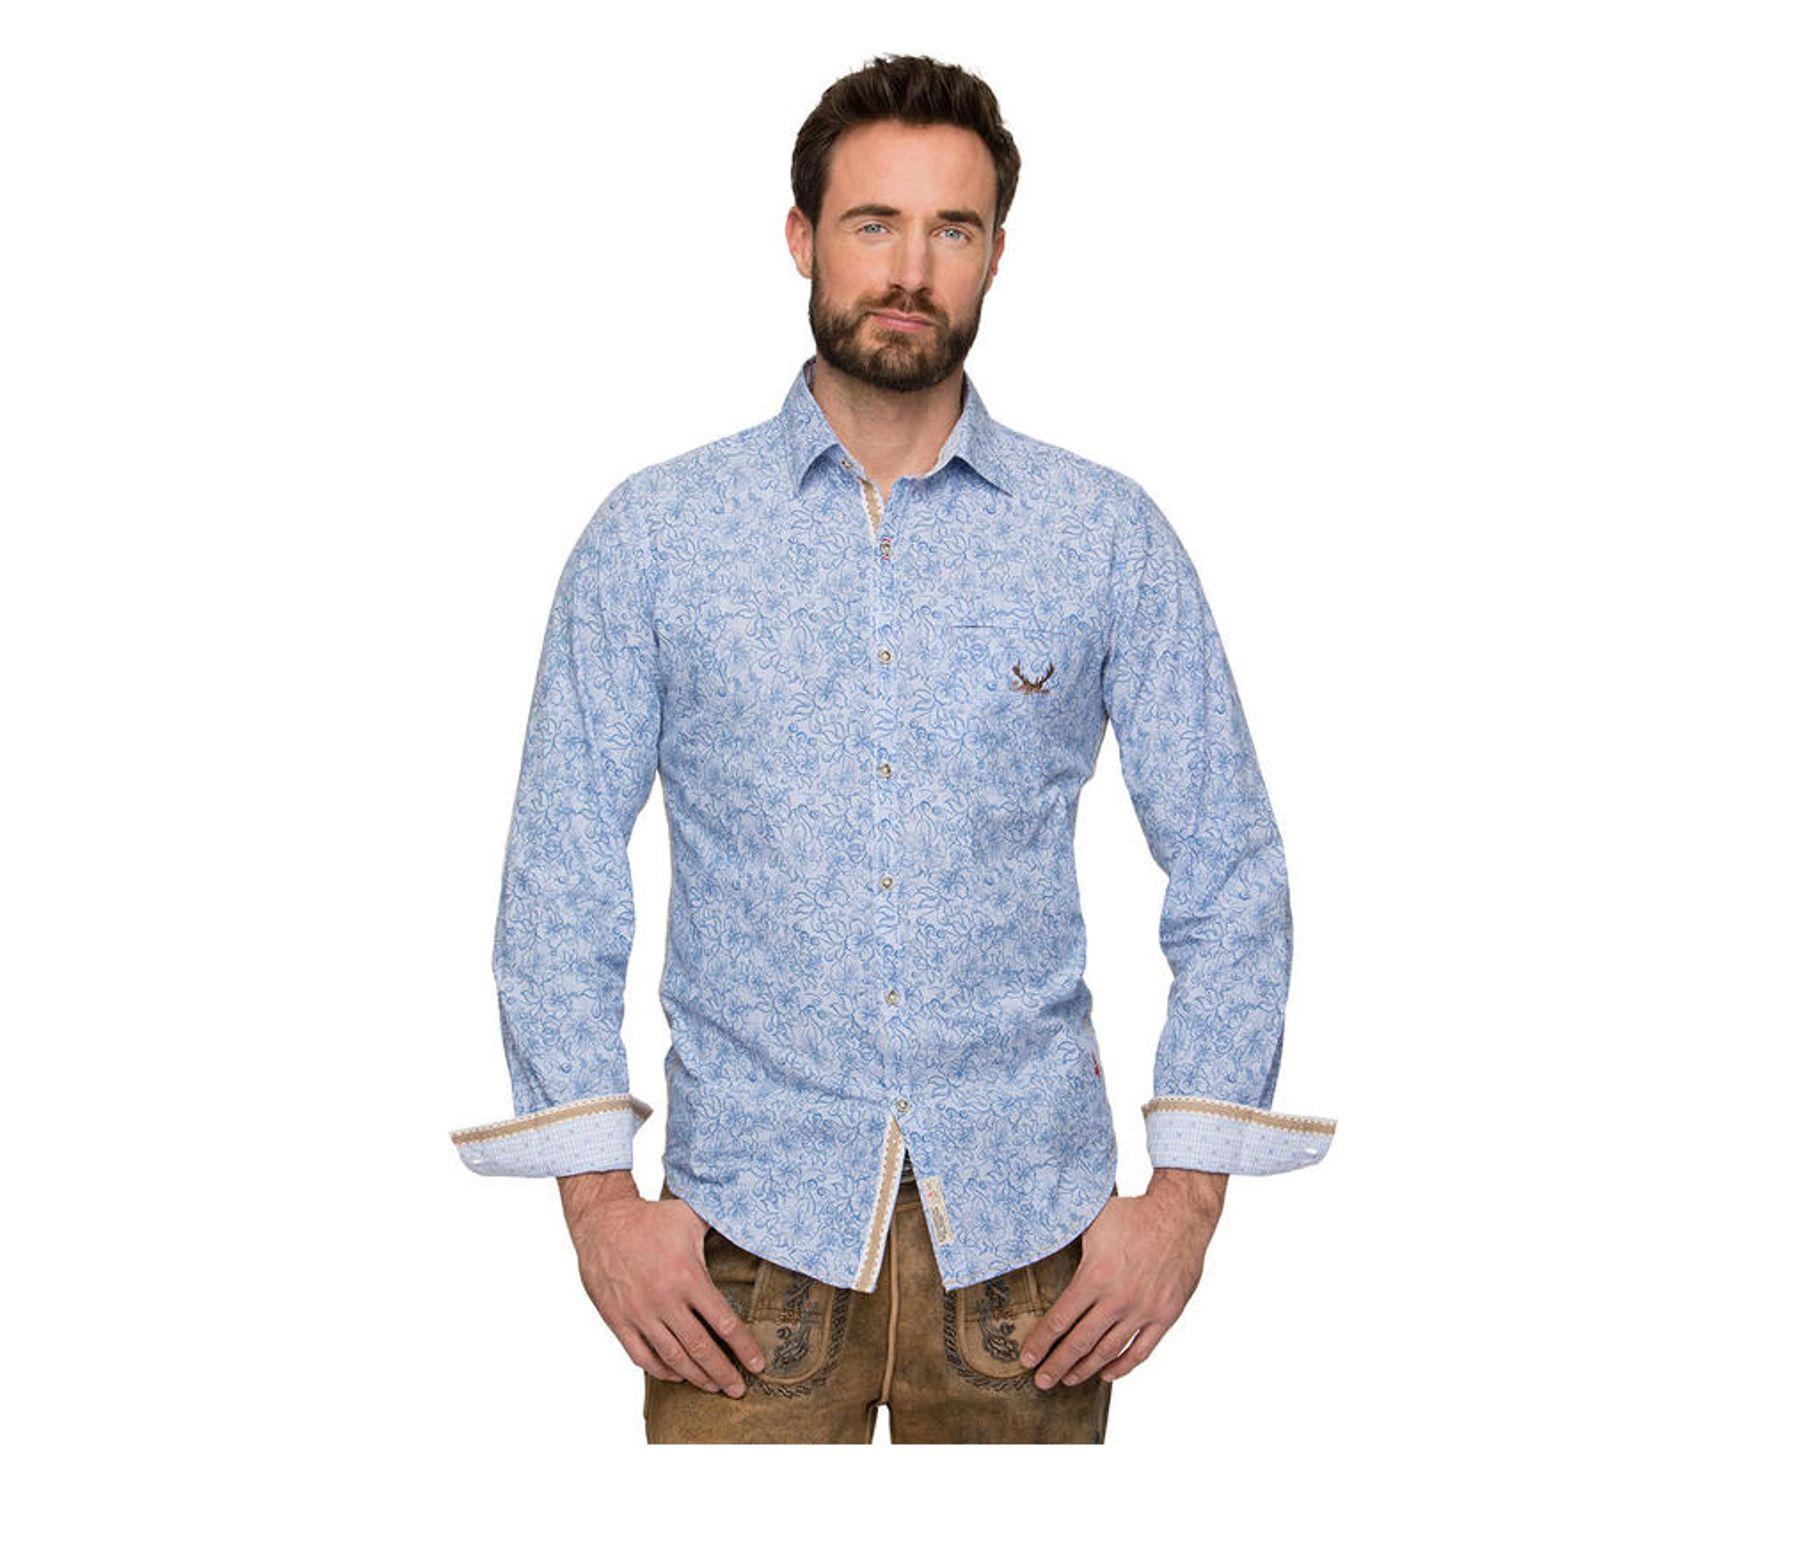 Stockerpoint - Herren Trachtenhemd in Blue stripe, James – Bild 1